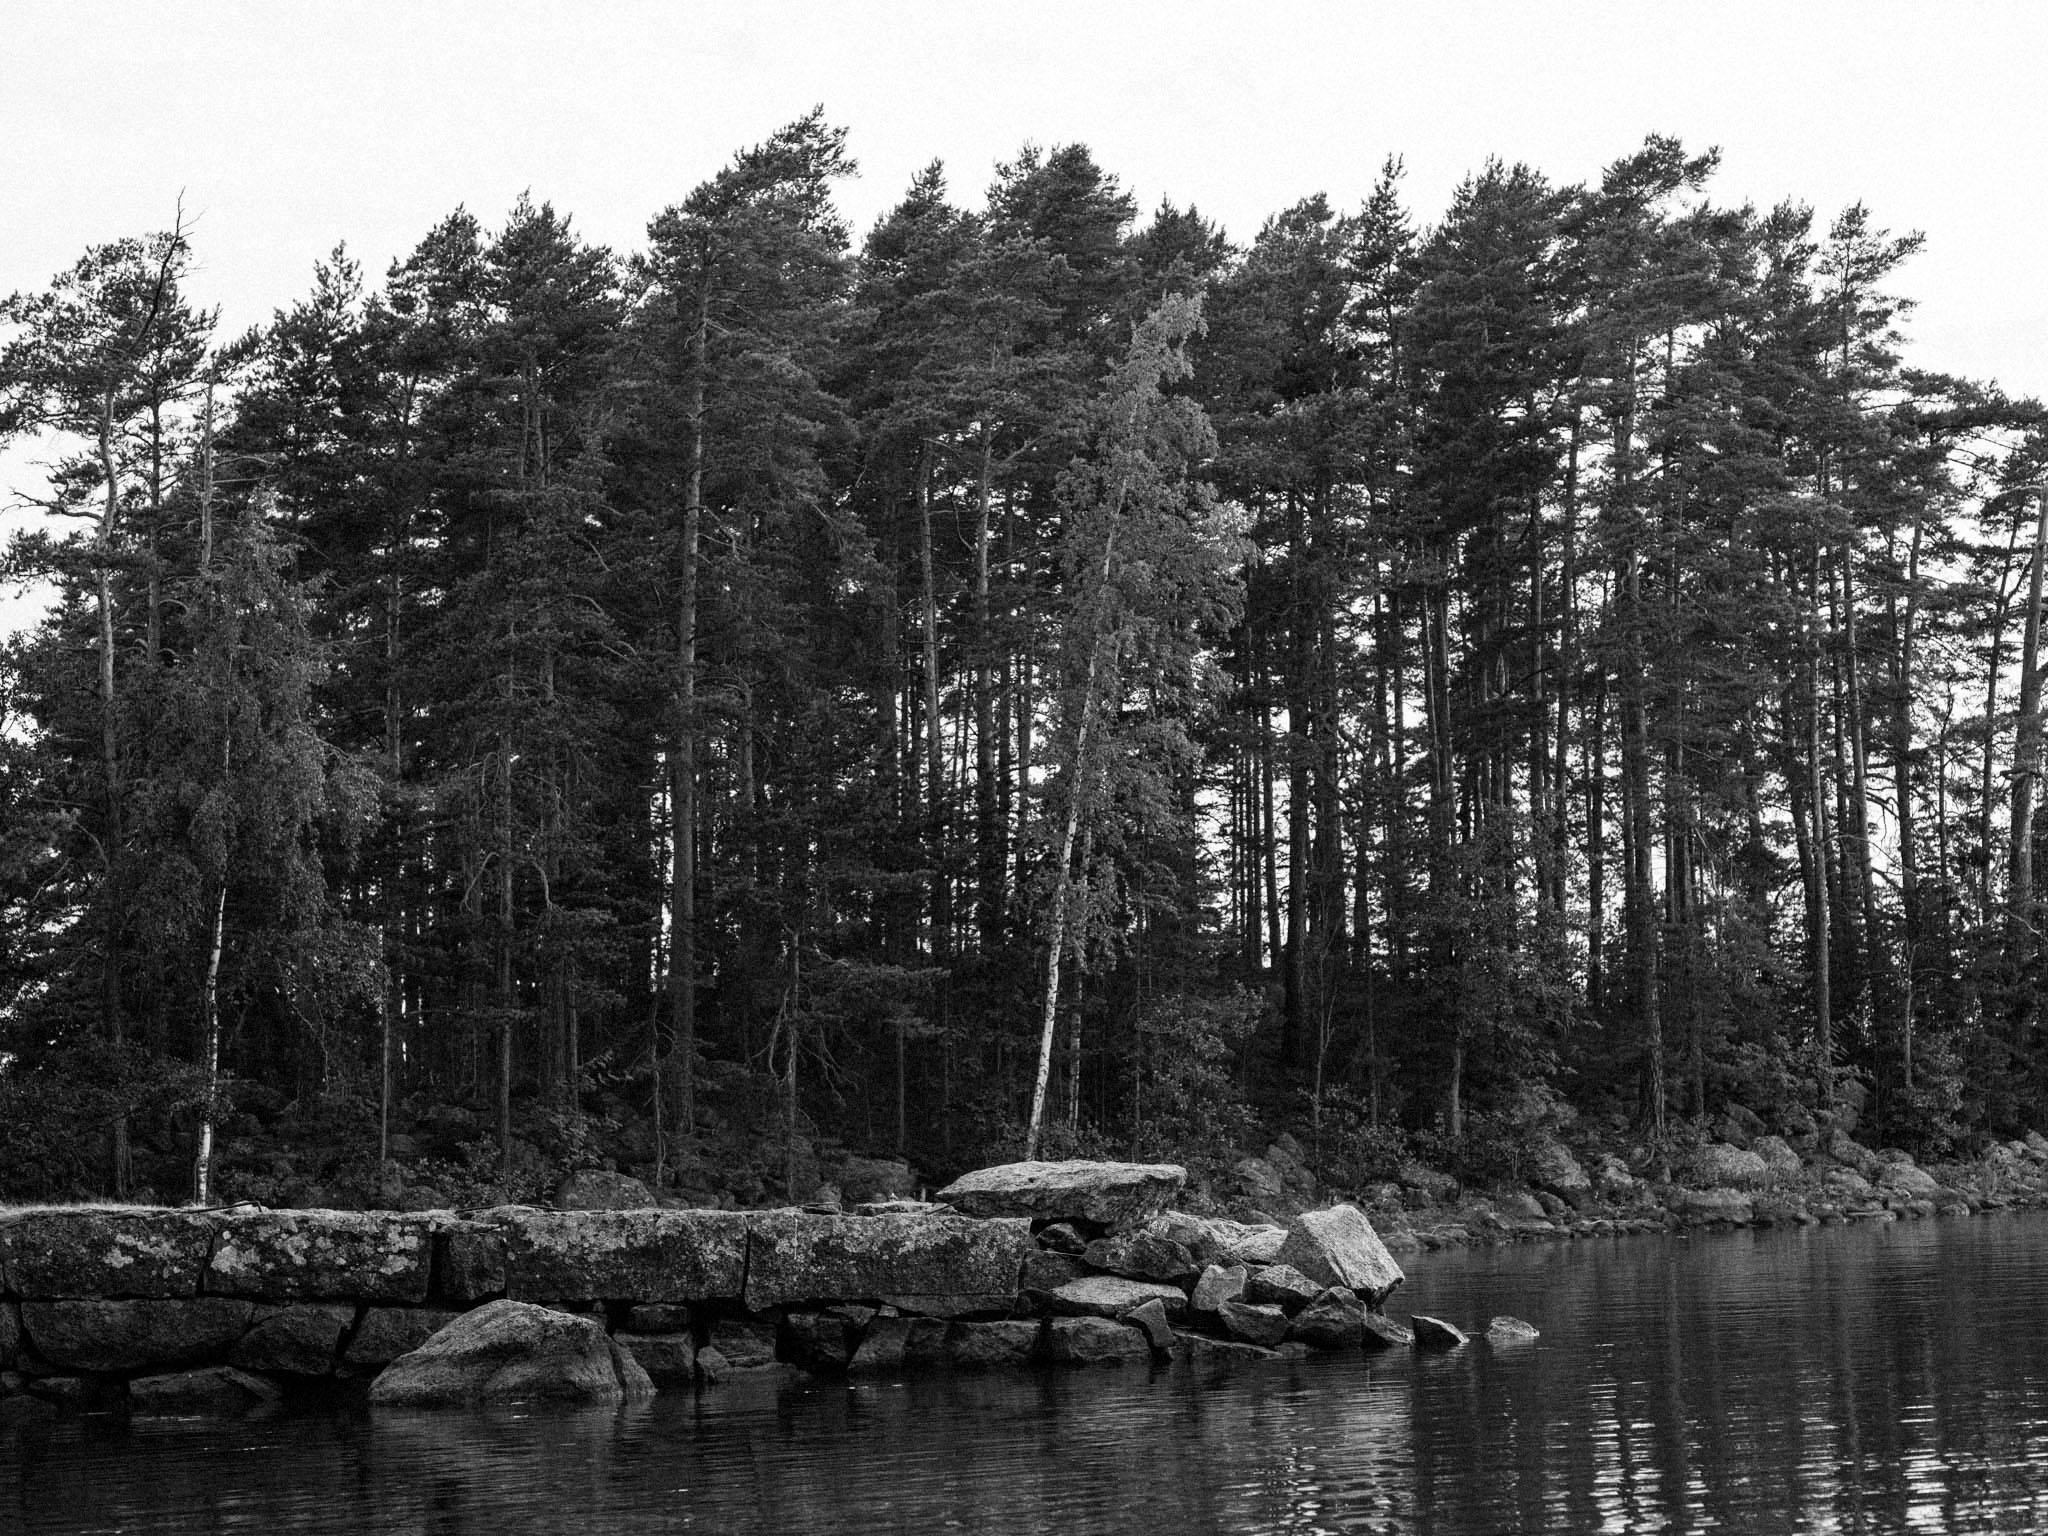 2018_07_26_ko_Kulturfonden_1973.jpg